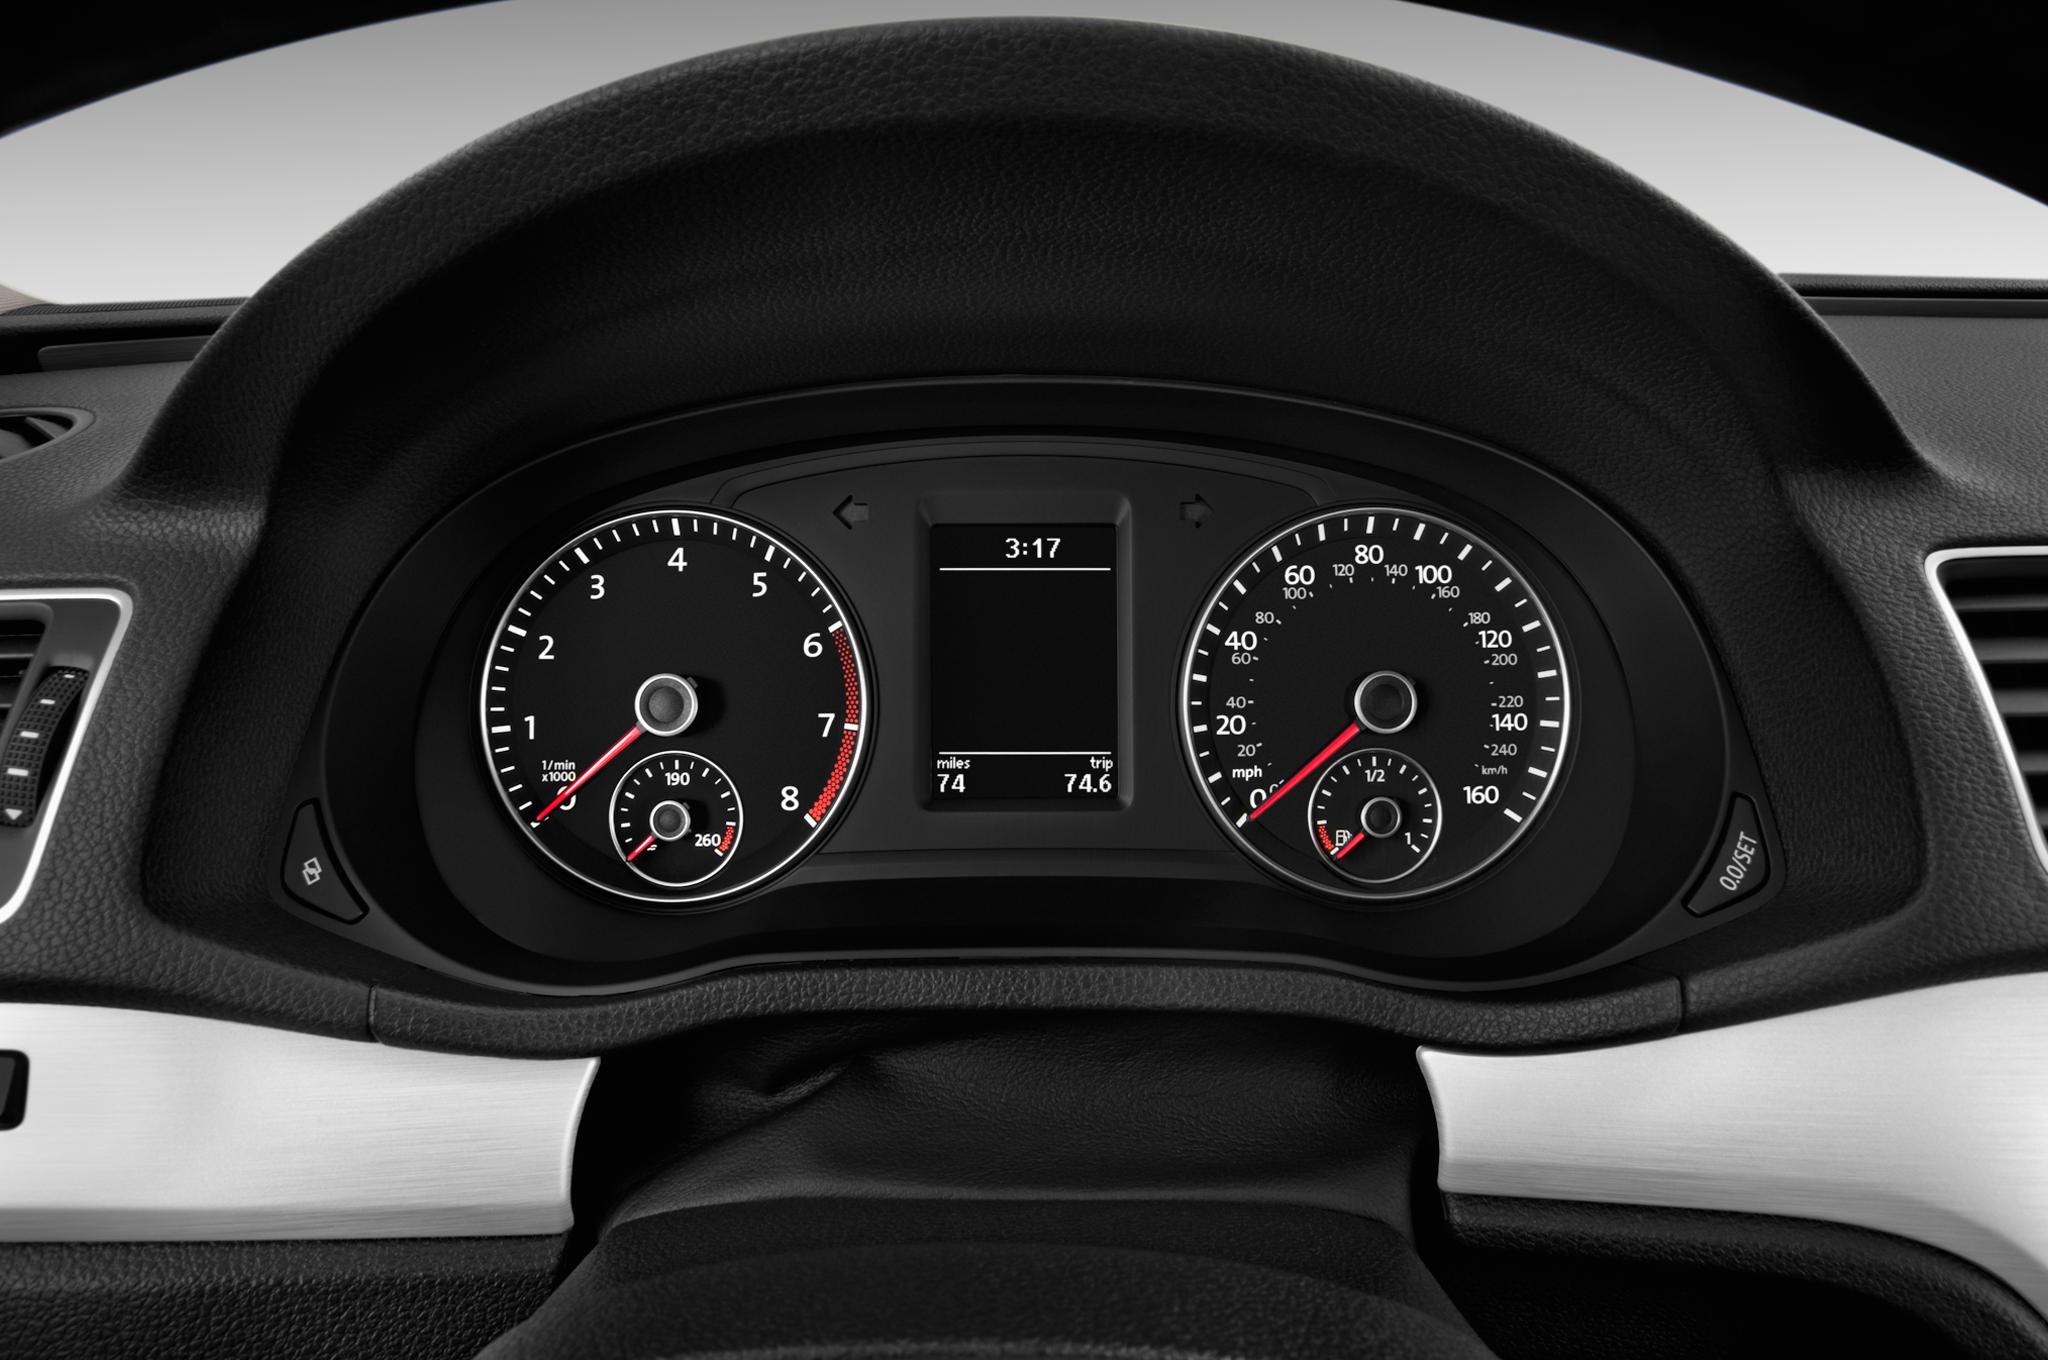 2014 volkswagen passat gains more efficient 18t engine 6570 biocorpaavc Gallery